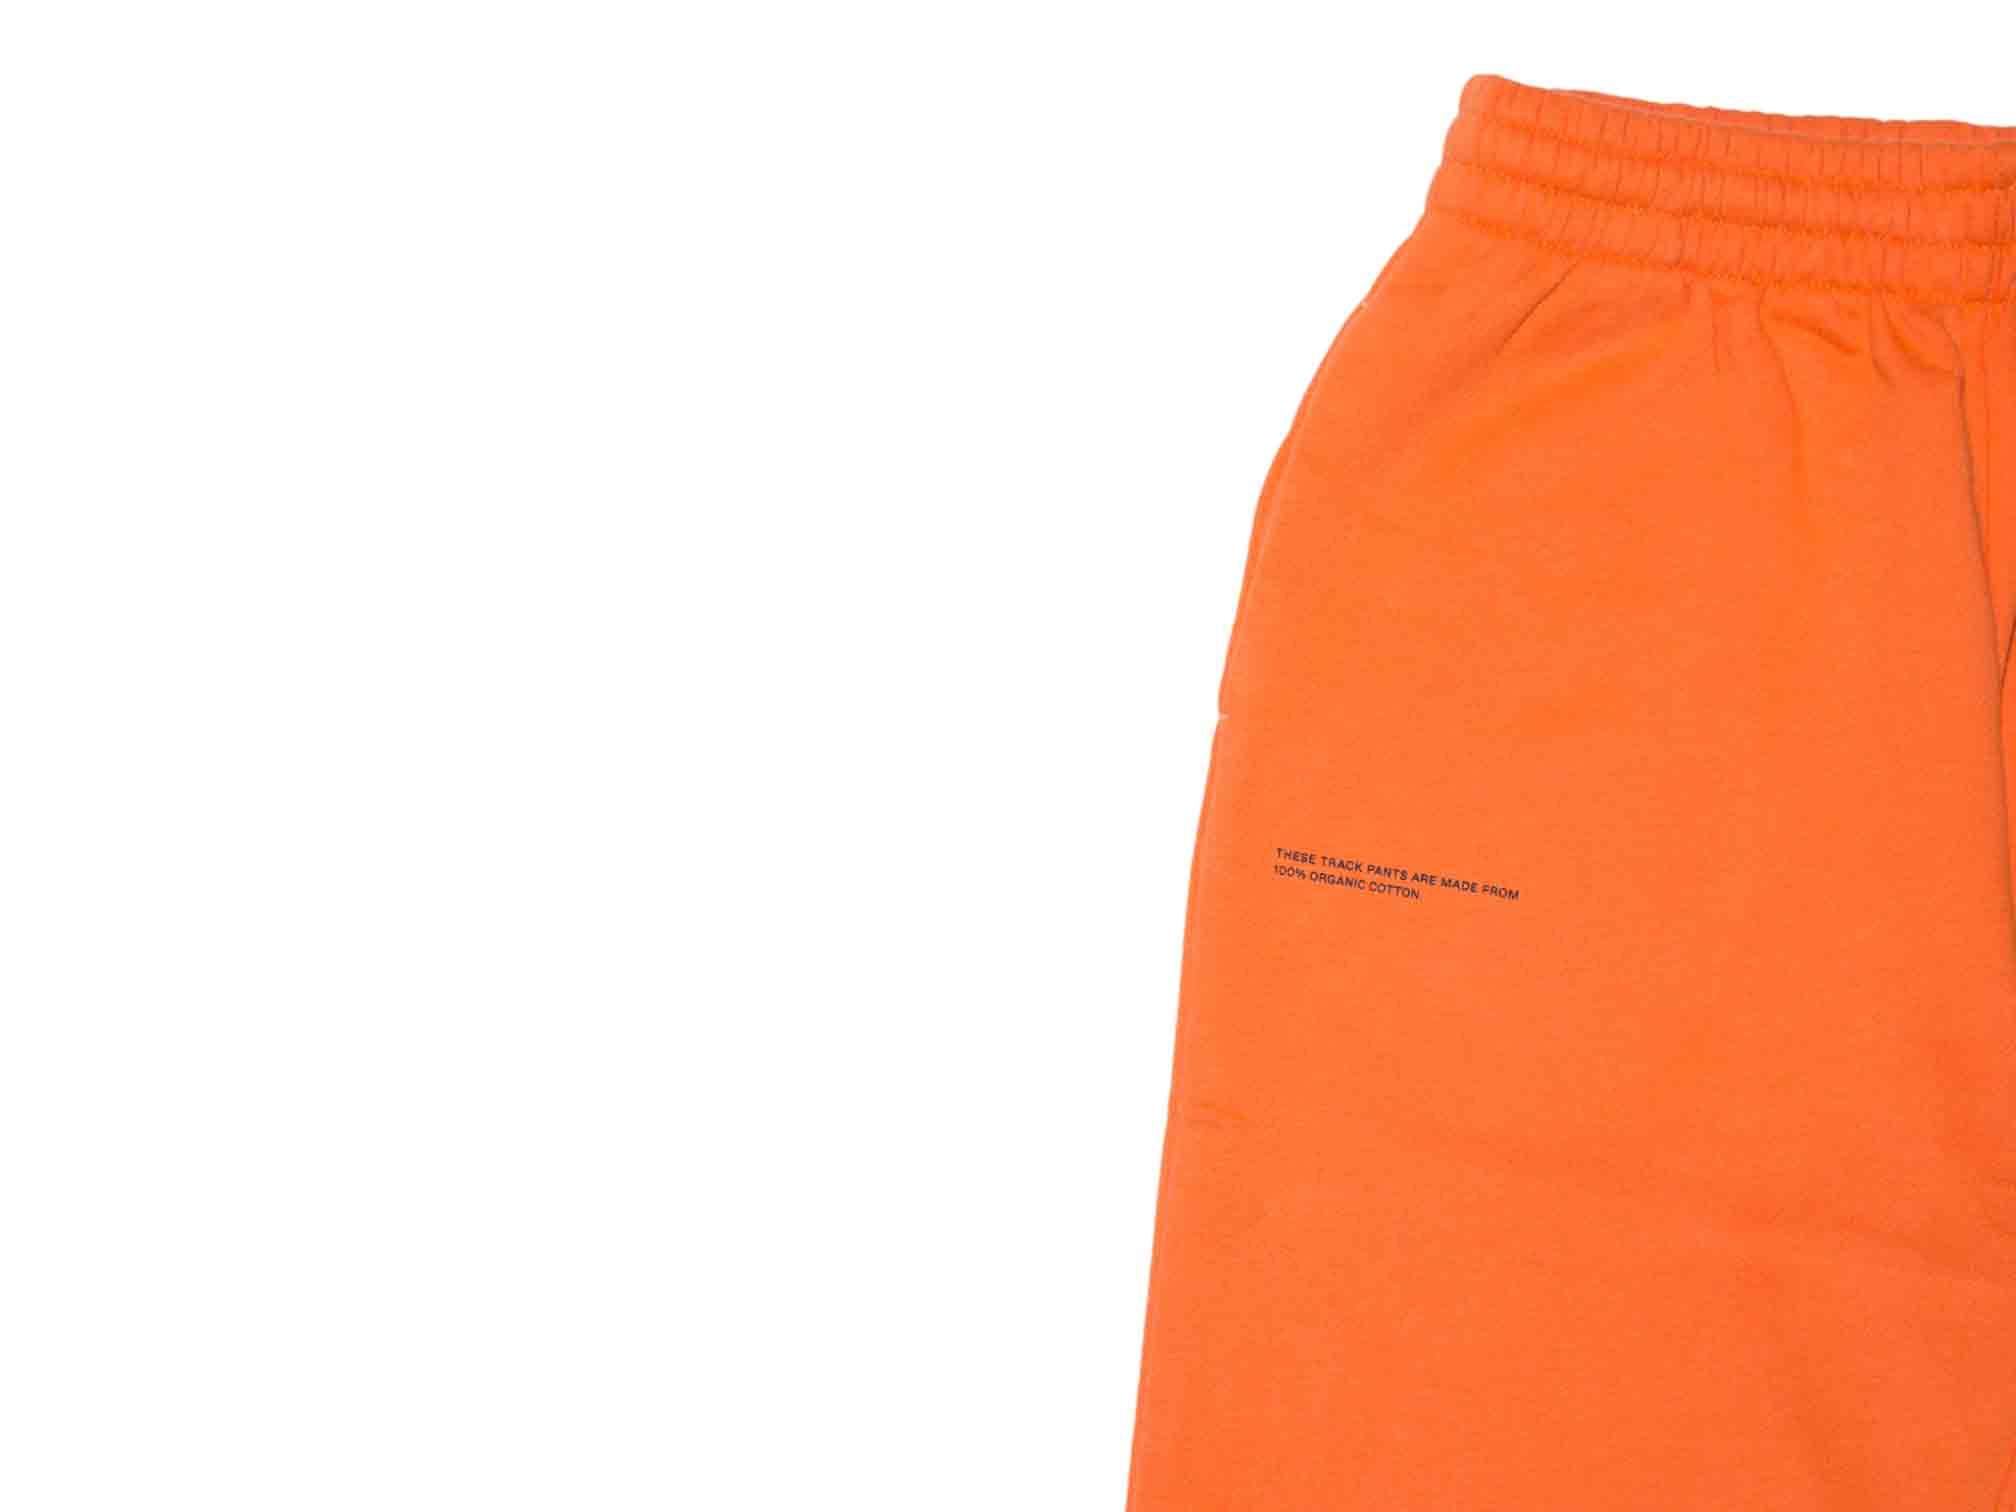 slide 2 - Persimmon Orange Organic Cotton Track Pants